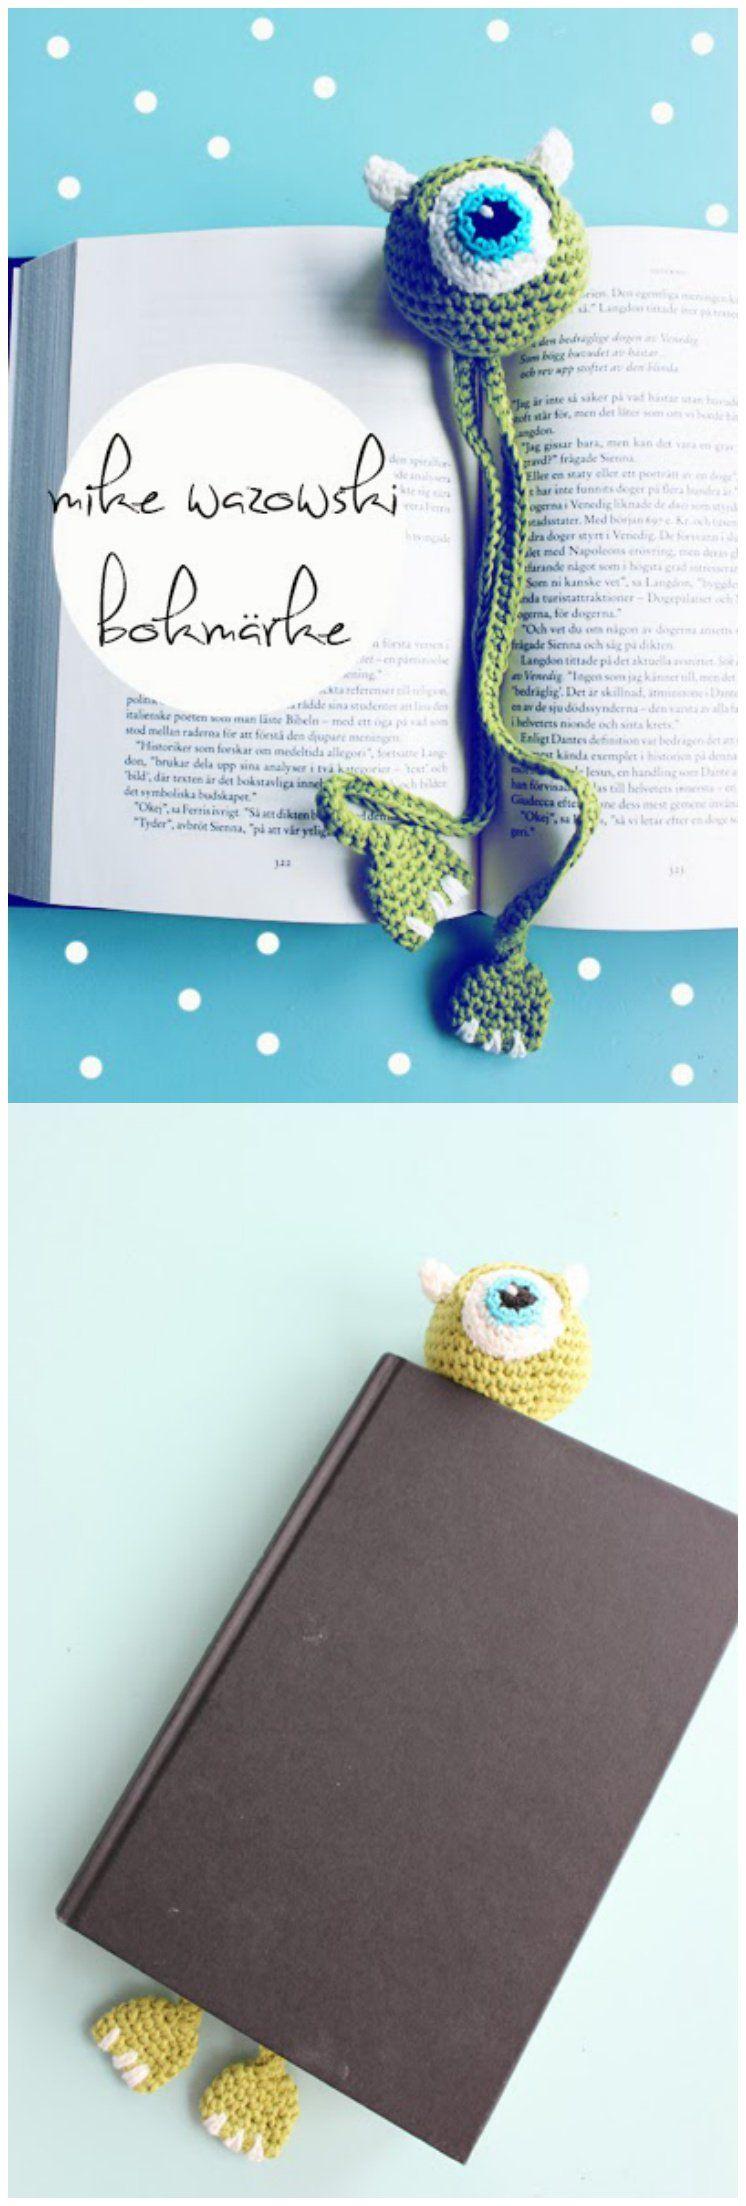 Monster Bookmark FREE Crochet Pattern | Crochet Patterns | Pinterest ...